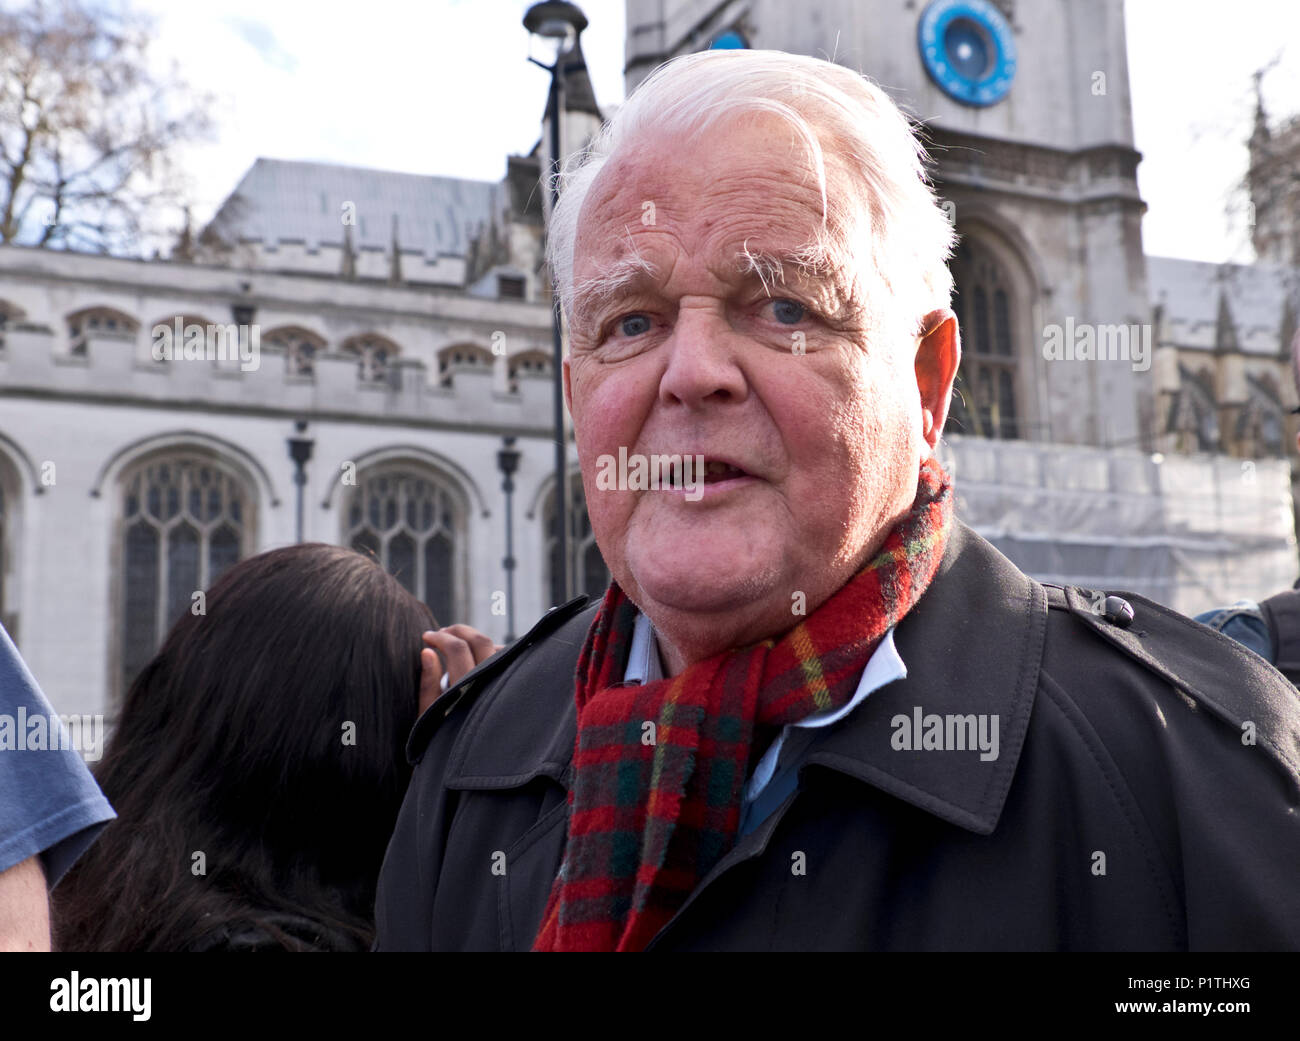 Bruce Kent, Protest durch die Londoner fragt nach einem Stopp der Bombenangriffe in Syrien 29. April 2018 Stockbild